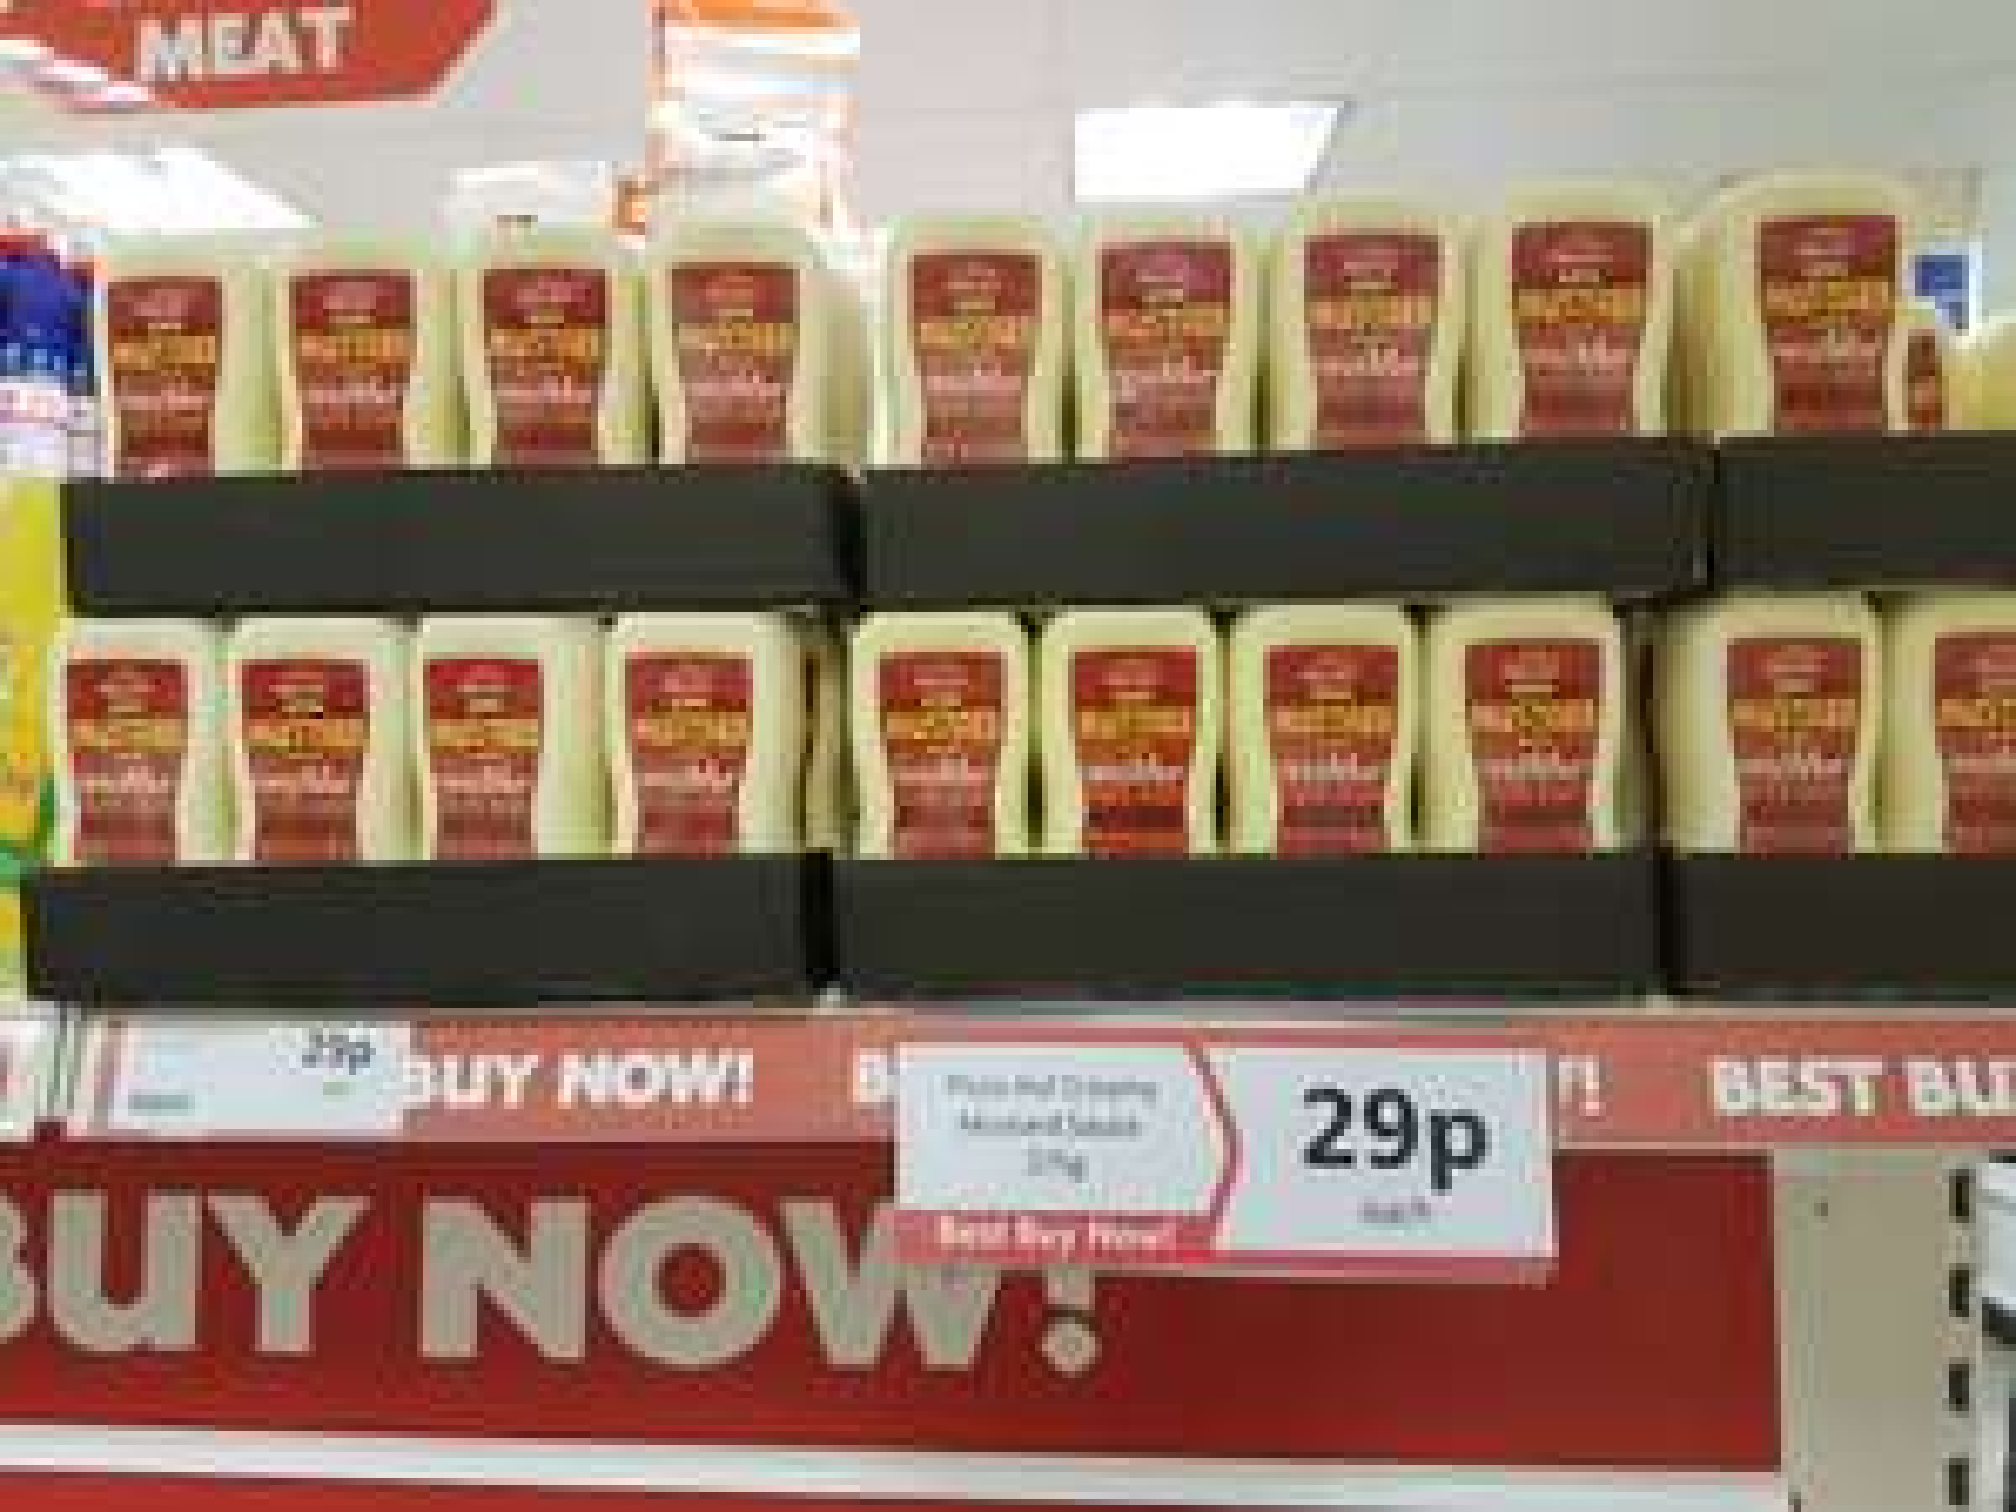 Pizza Hut creamy mustard sauce 29p @ Heron foods